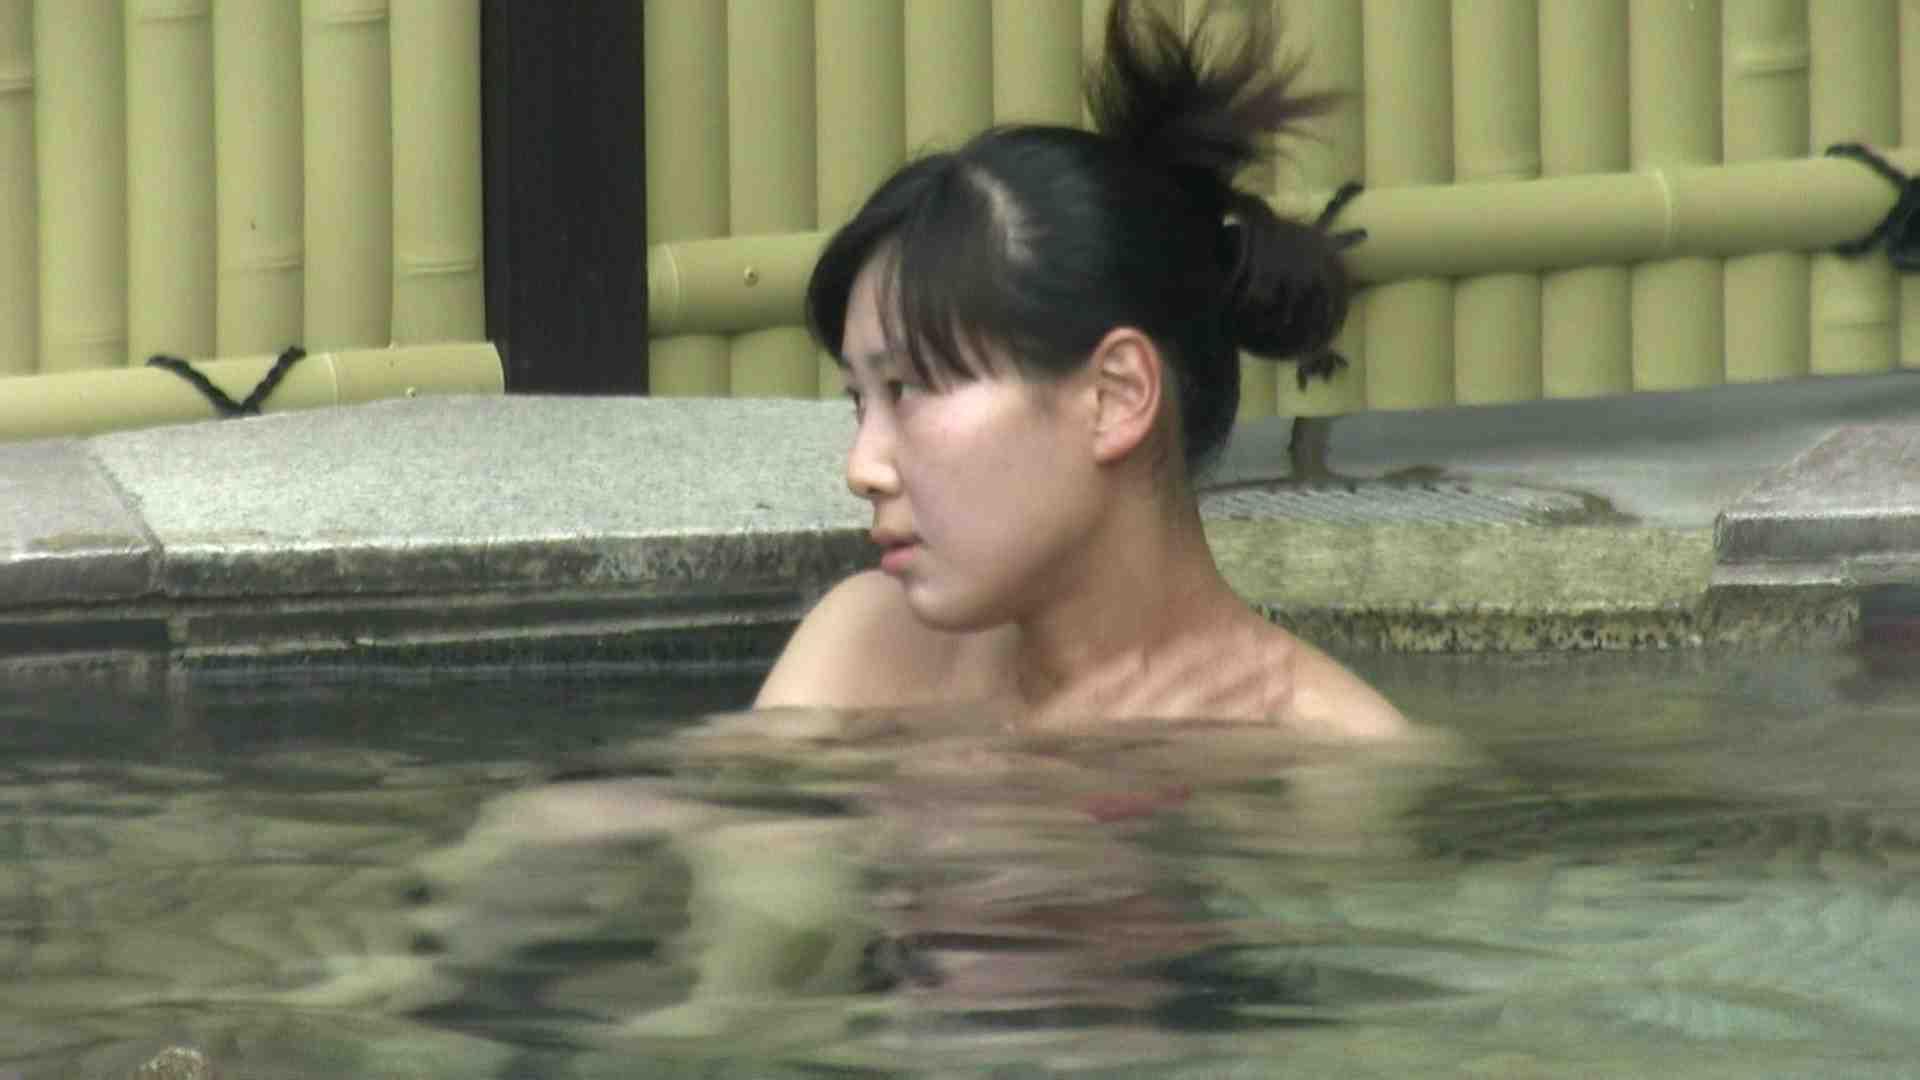 Aquaな露天風呂Vol.665 露天風呂編  86PIX 56